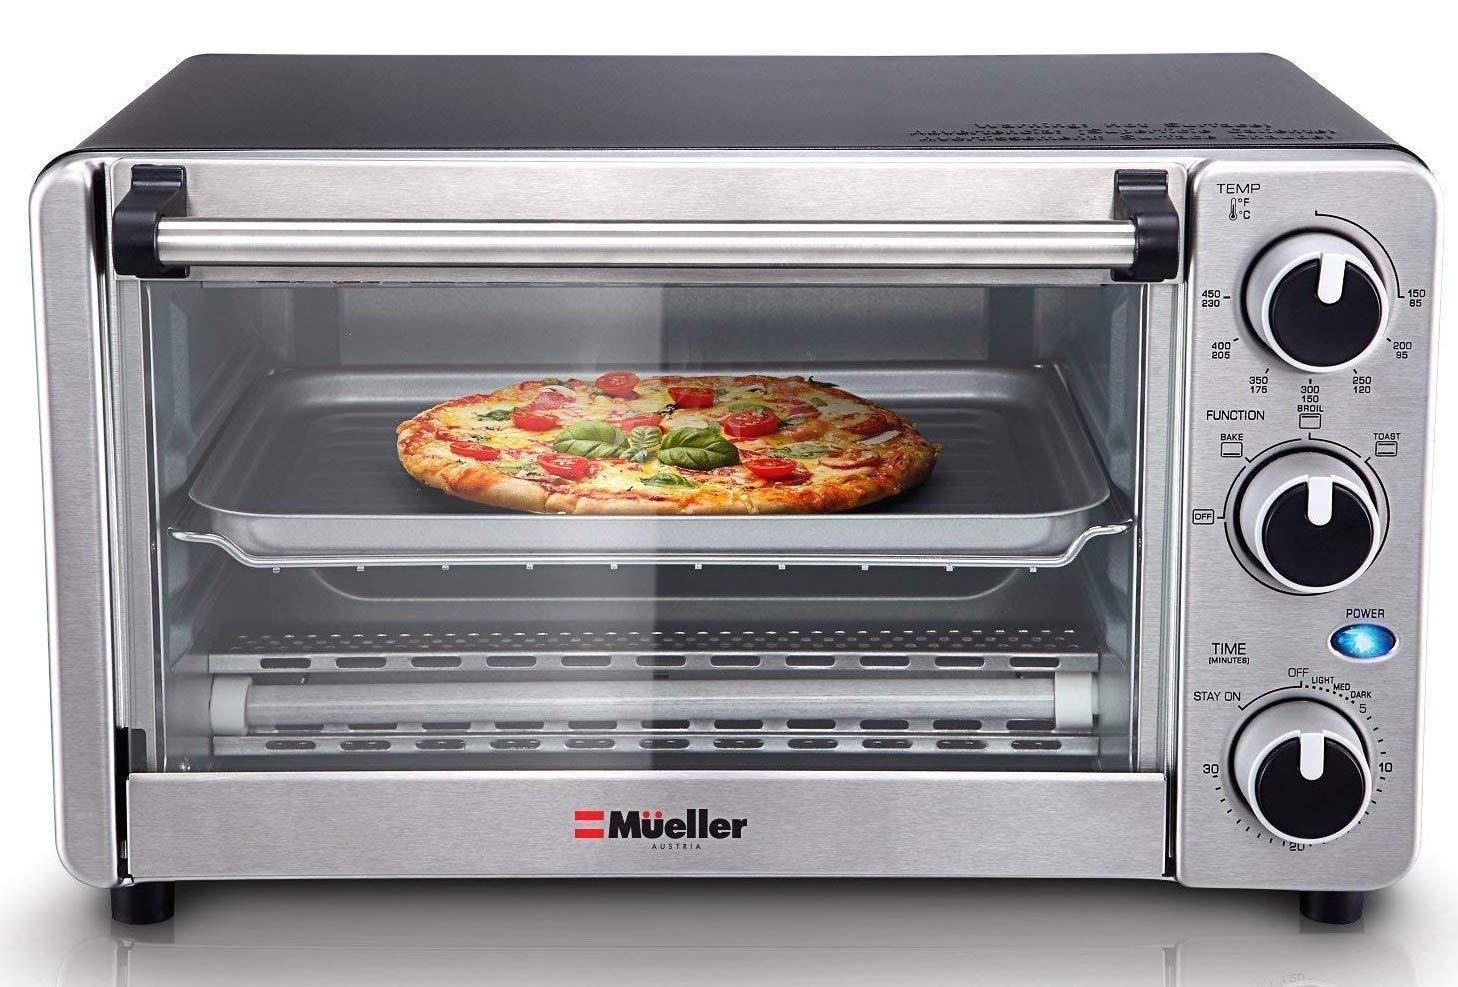 Toaster Oven 4 Slice Multi Function Stainless Steel Toast Bake